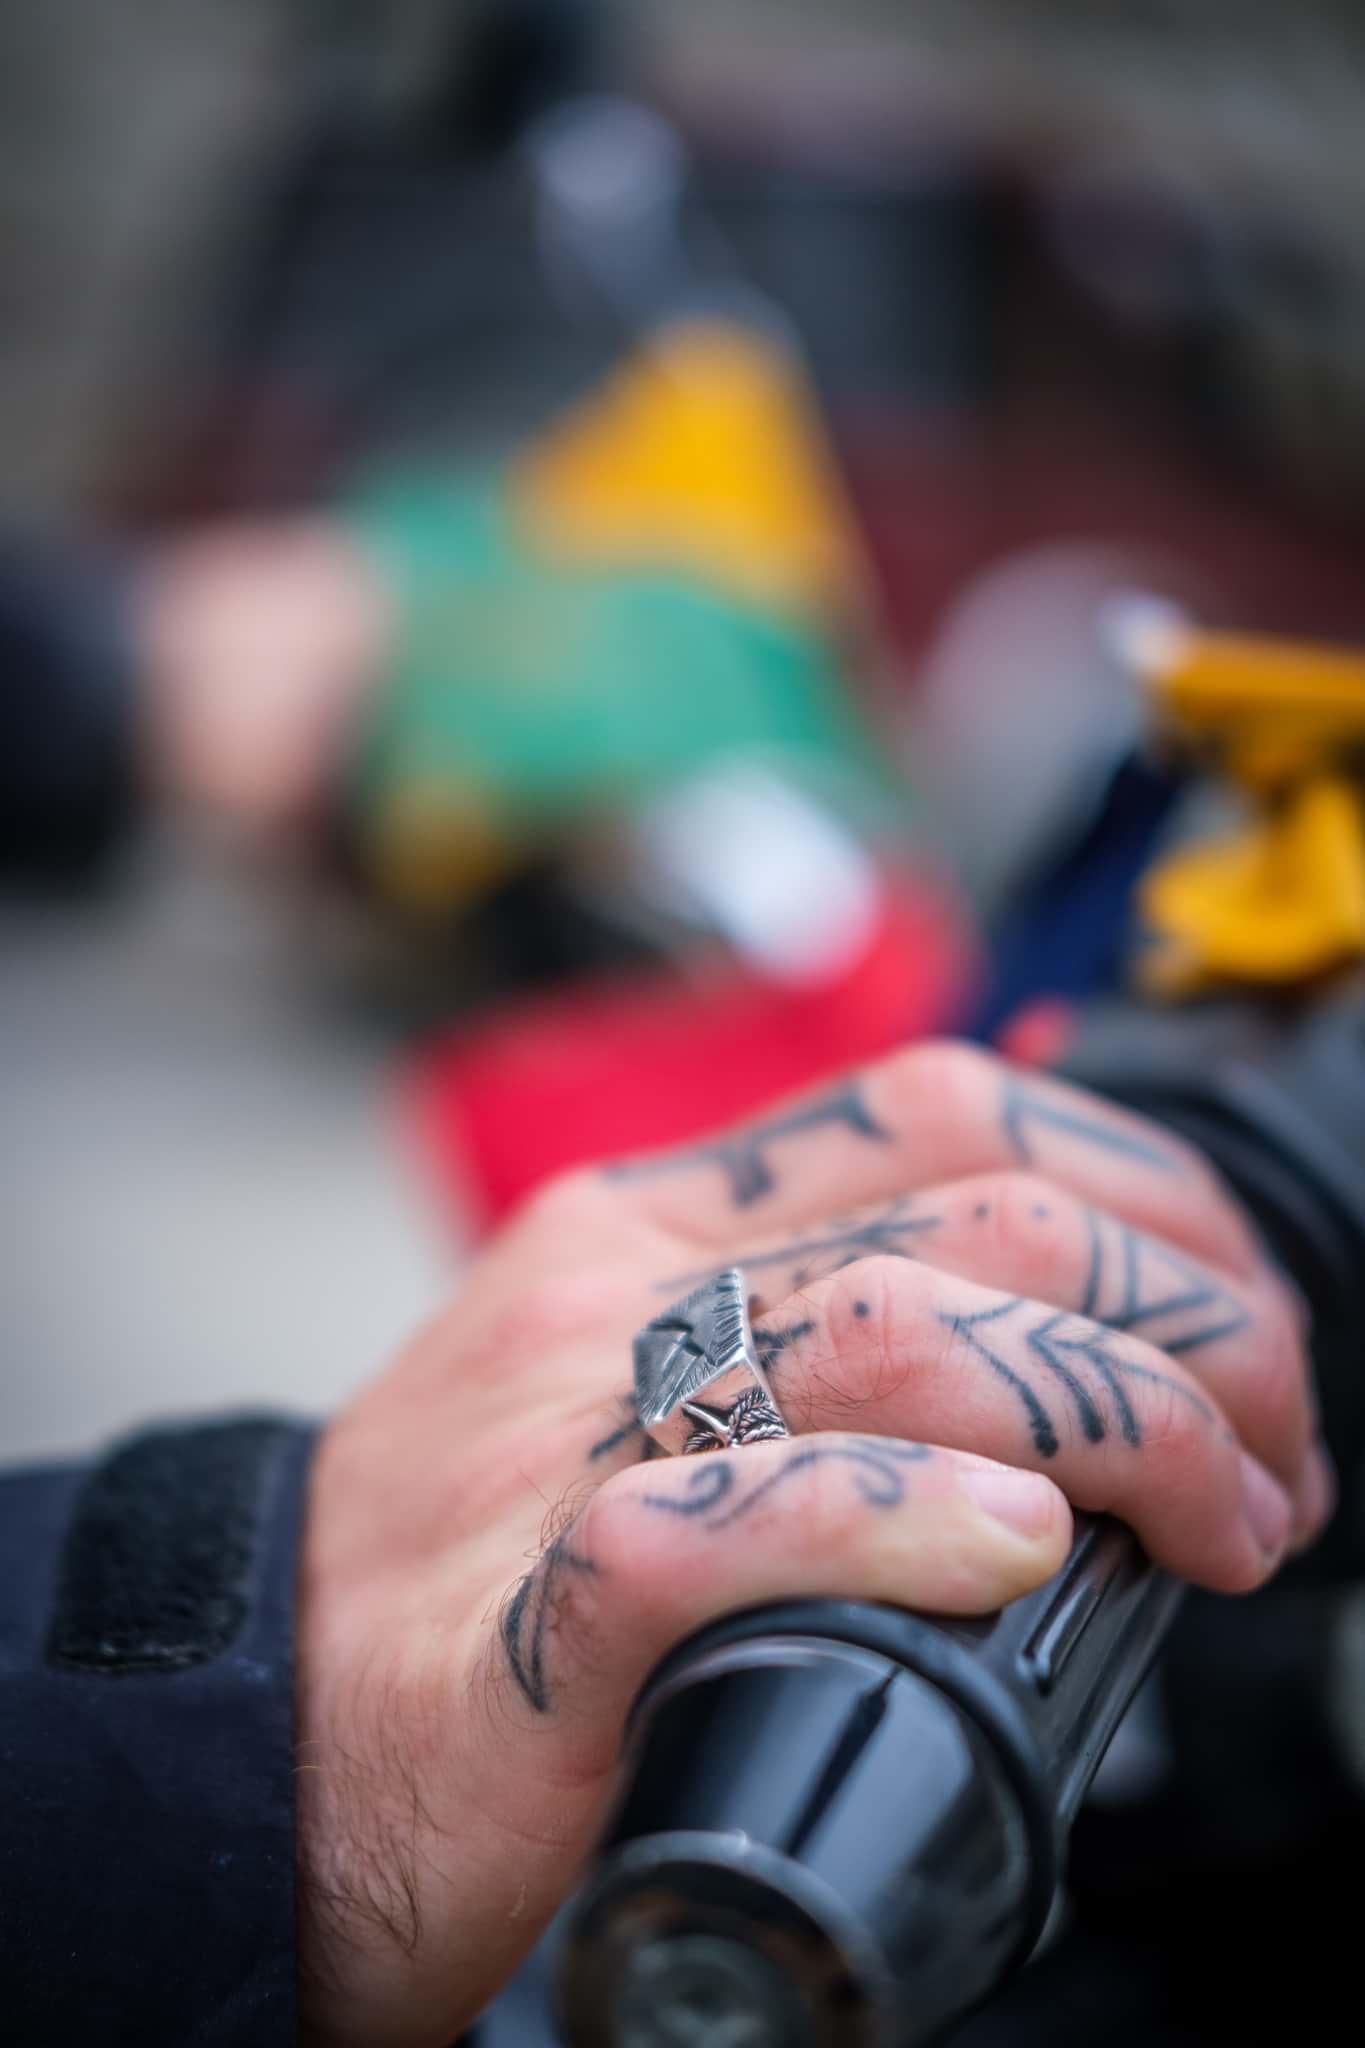 Hand with travel tattoos on a motorbike handlebar